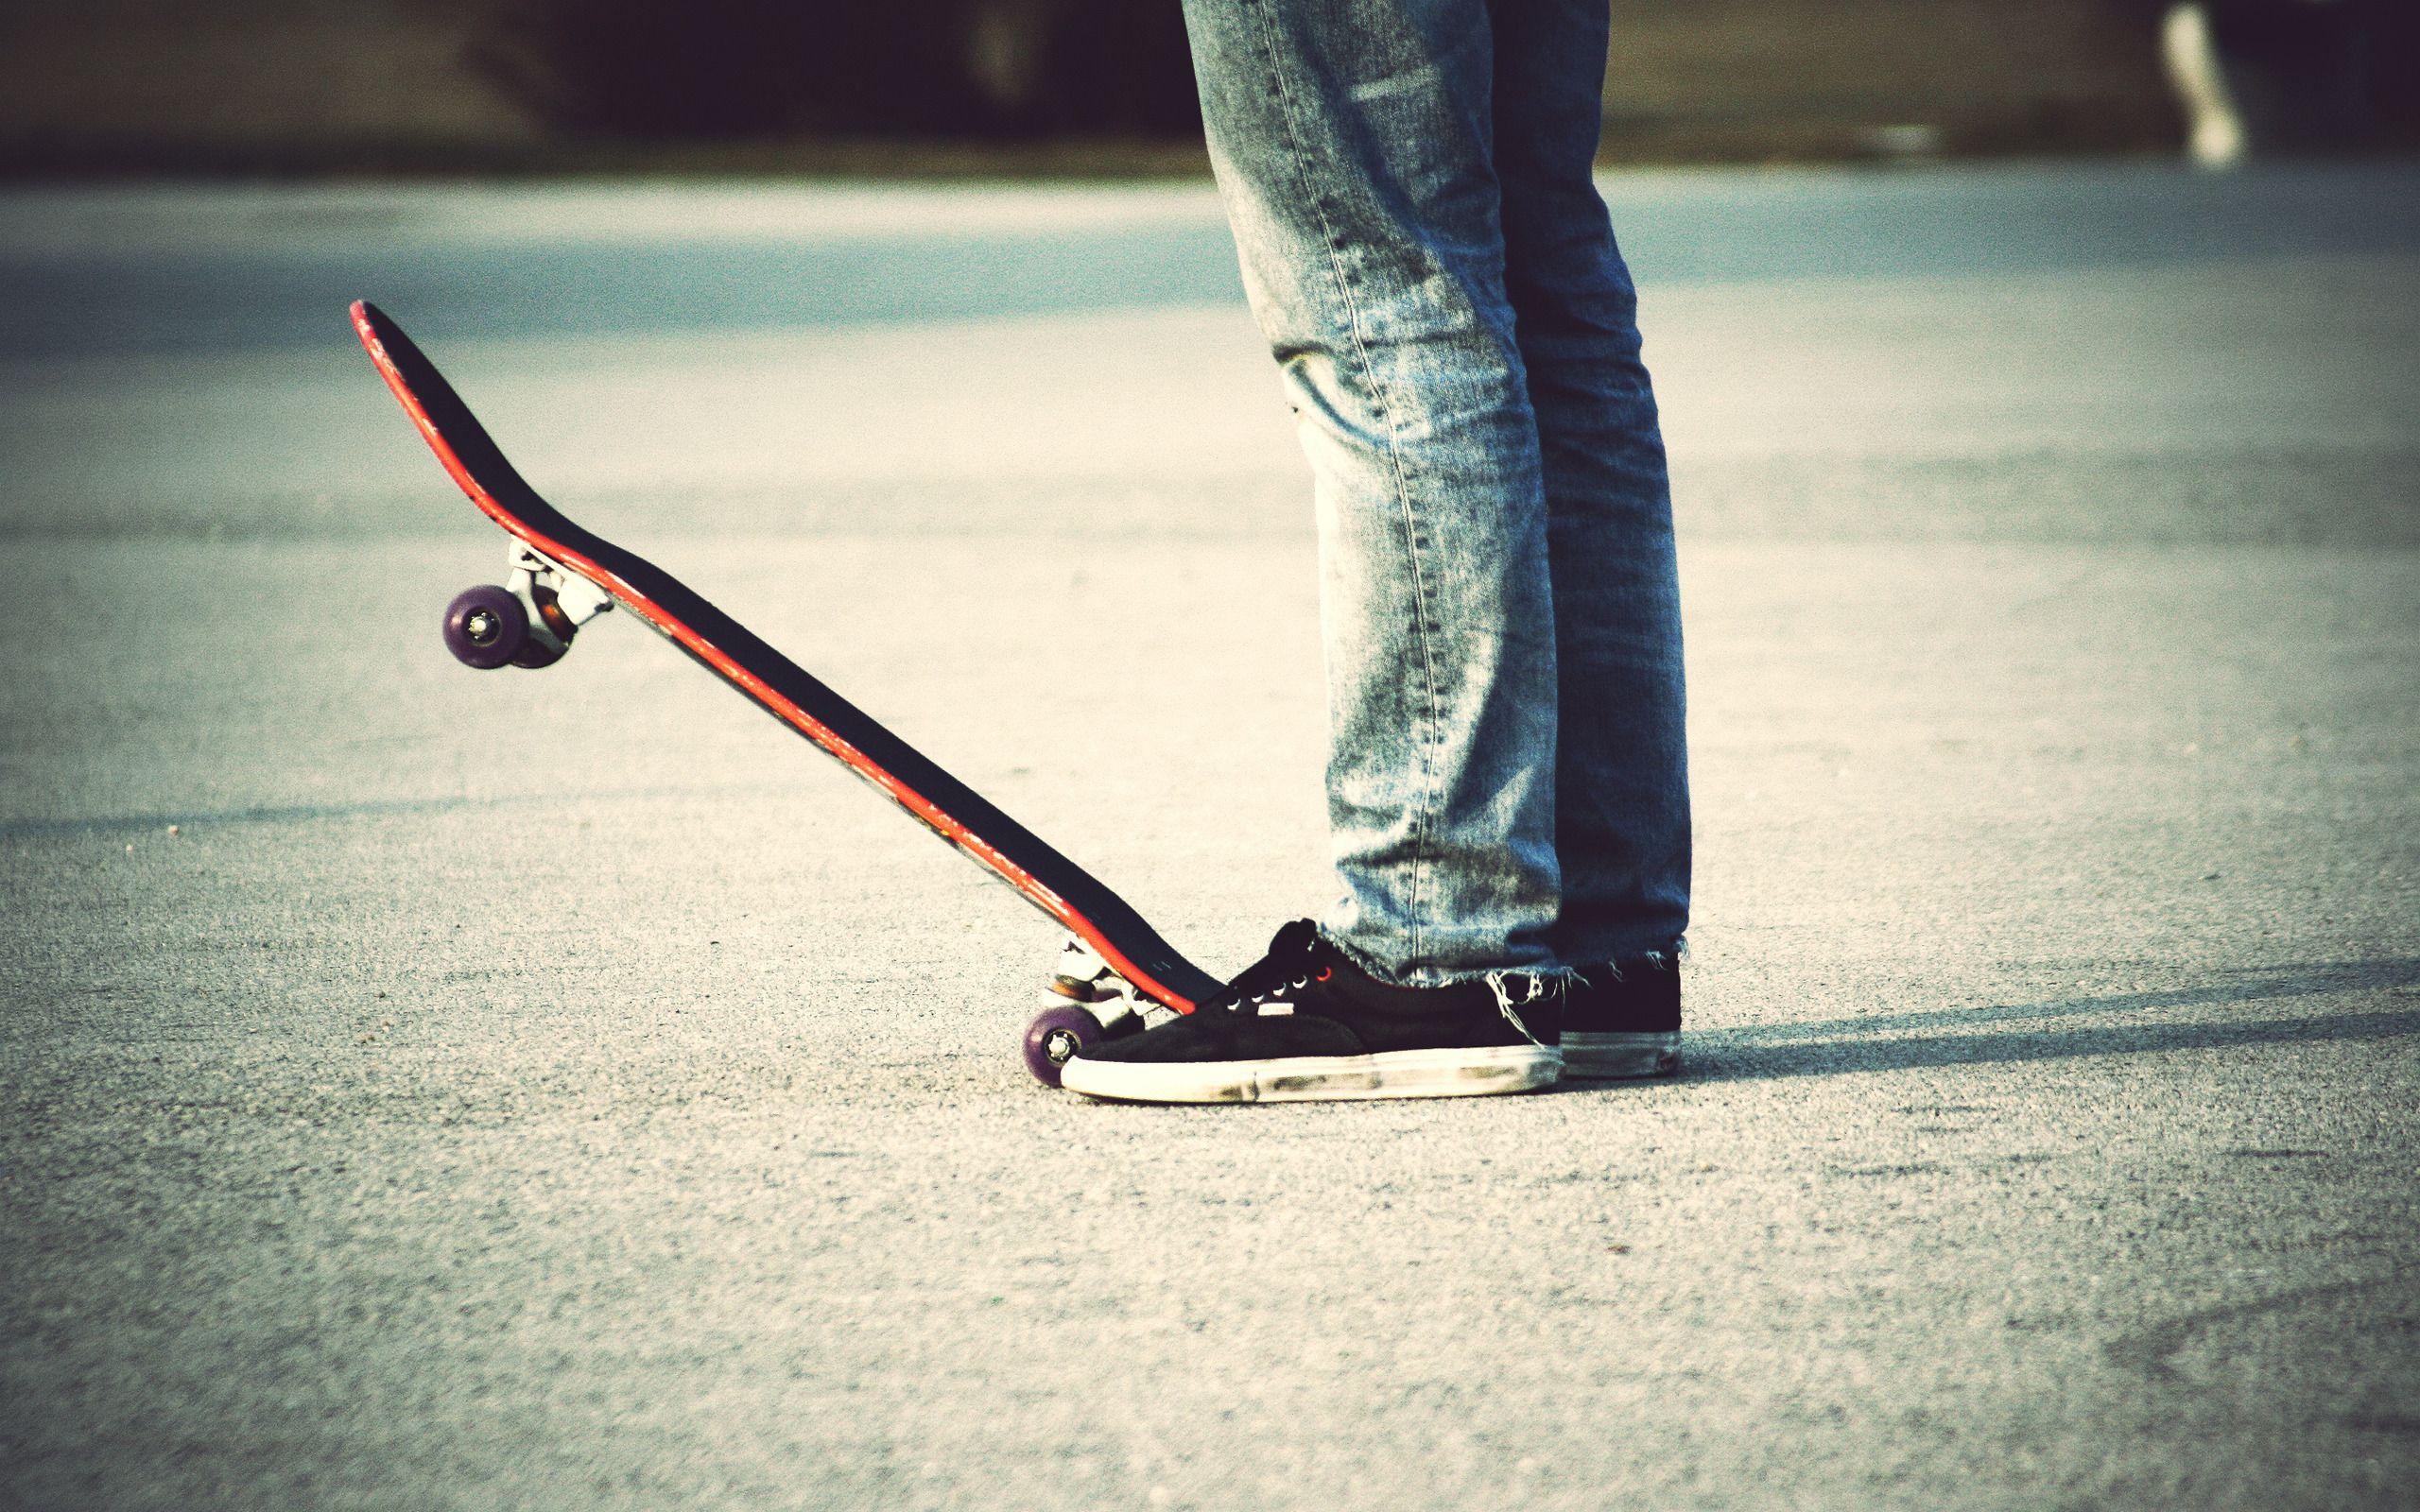 skateboarding - Google Search Vans Skateboard, Skateboard Pictures, Lifestyle Clothing, Skate 3,